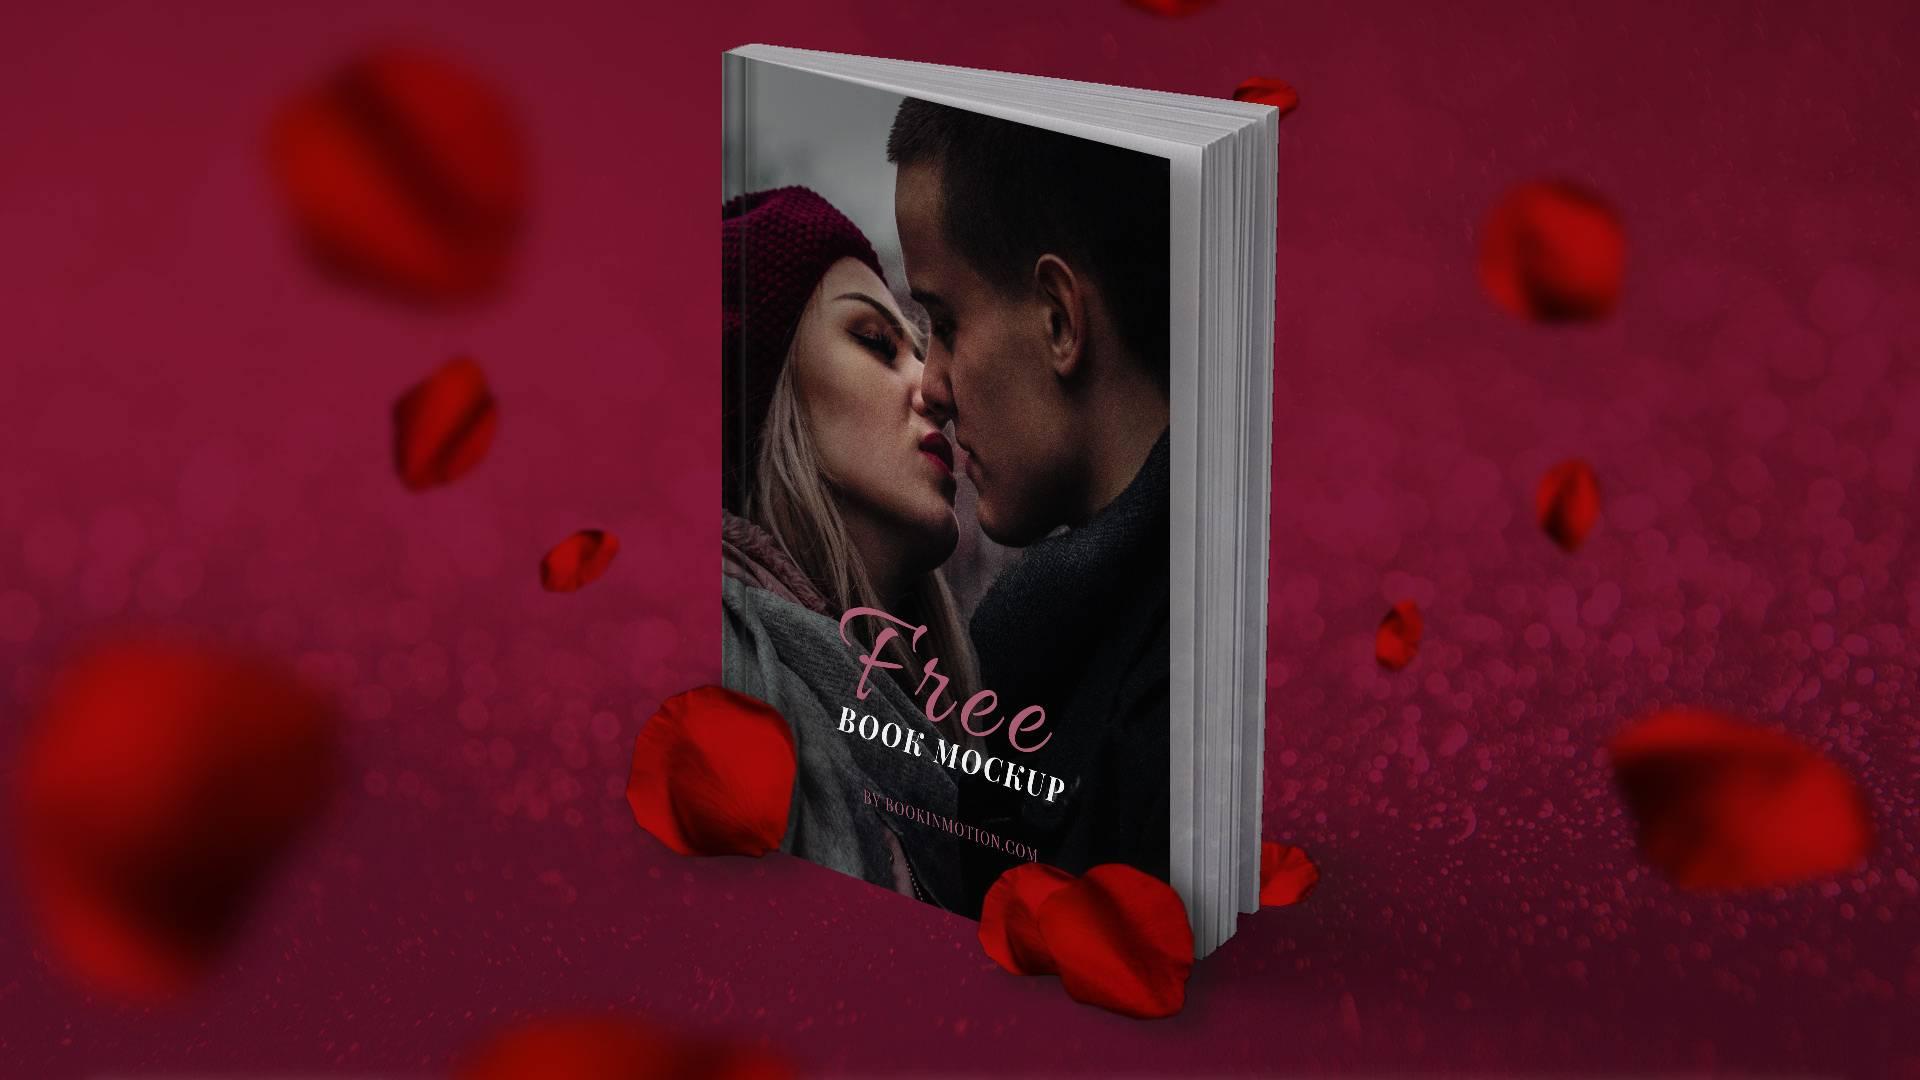 romantic book mockup with rose petals